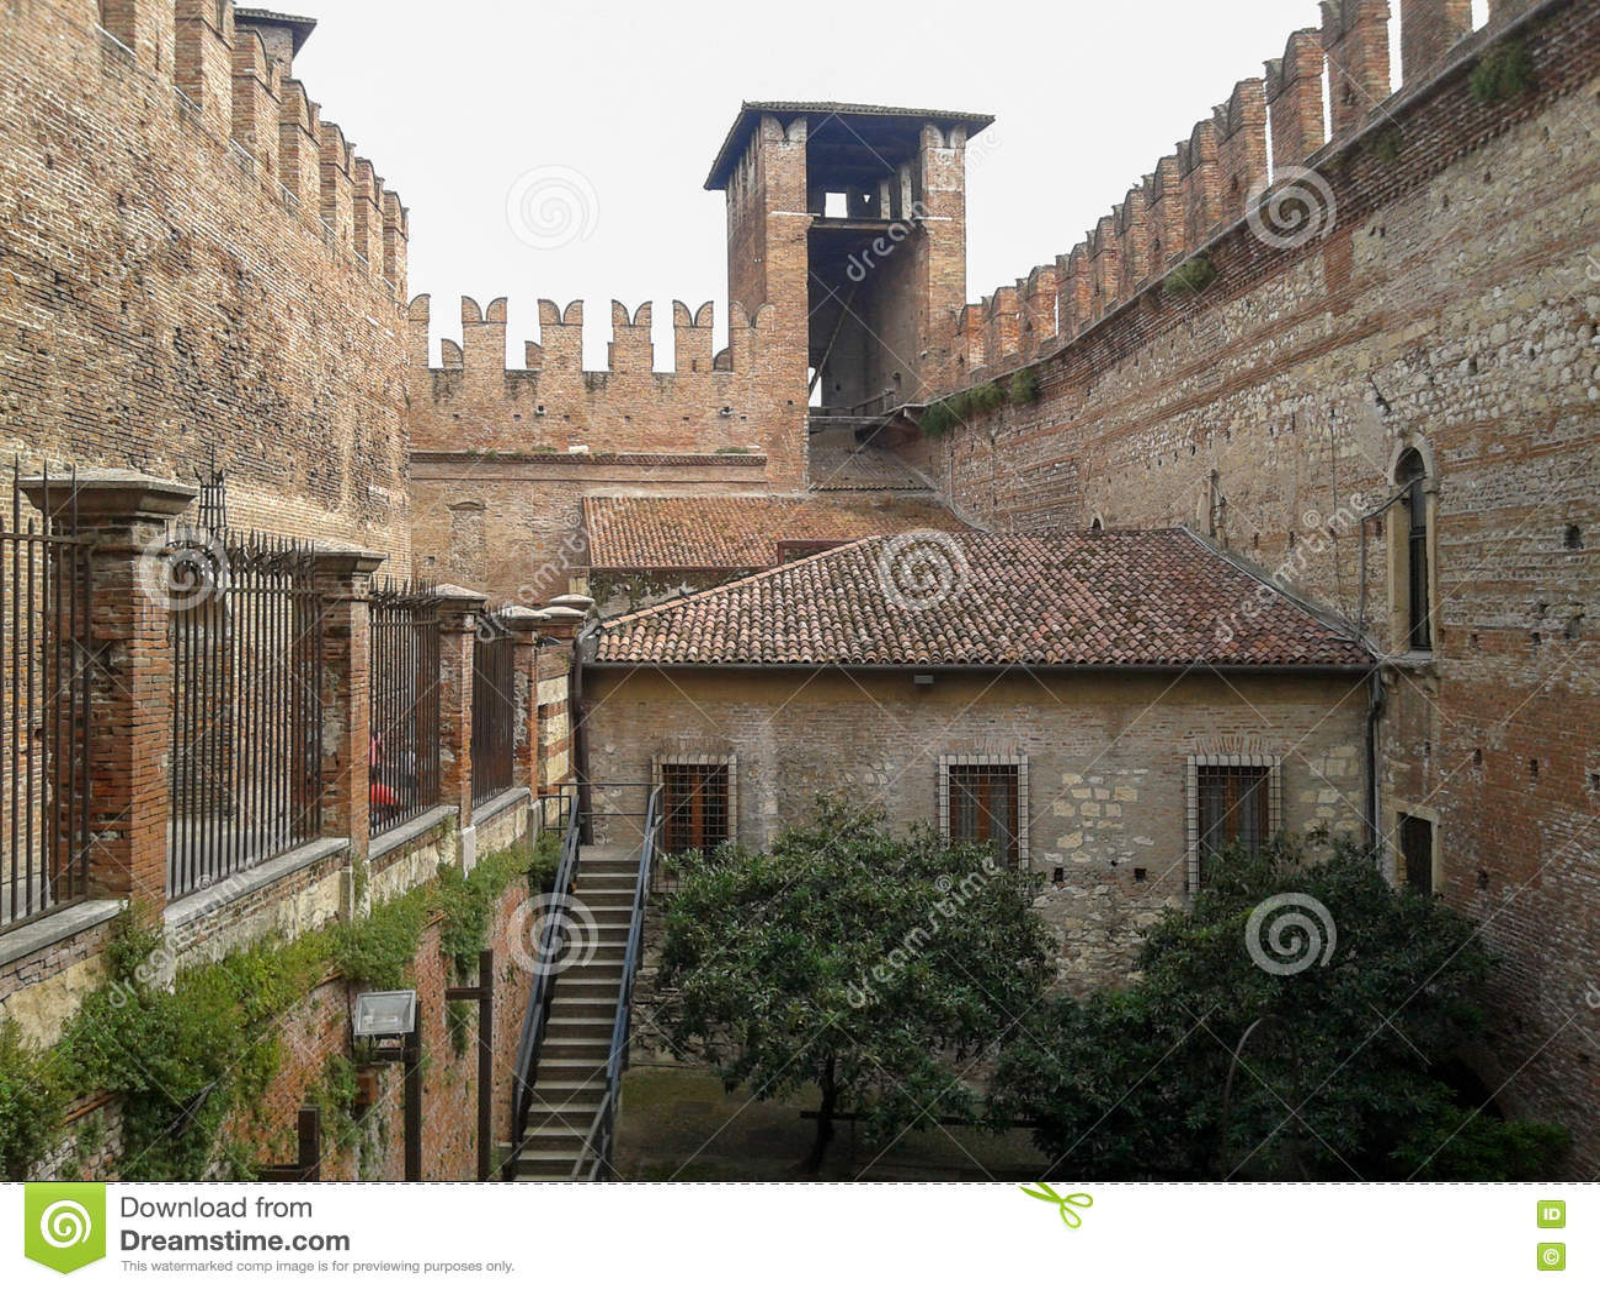 Museo Di Castelvecchio.Museo Di Castelvecchio A Verona Immagine Editoriale Immagine Di